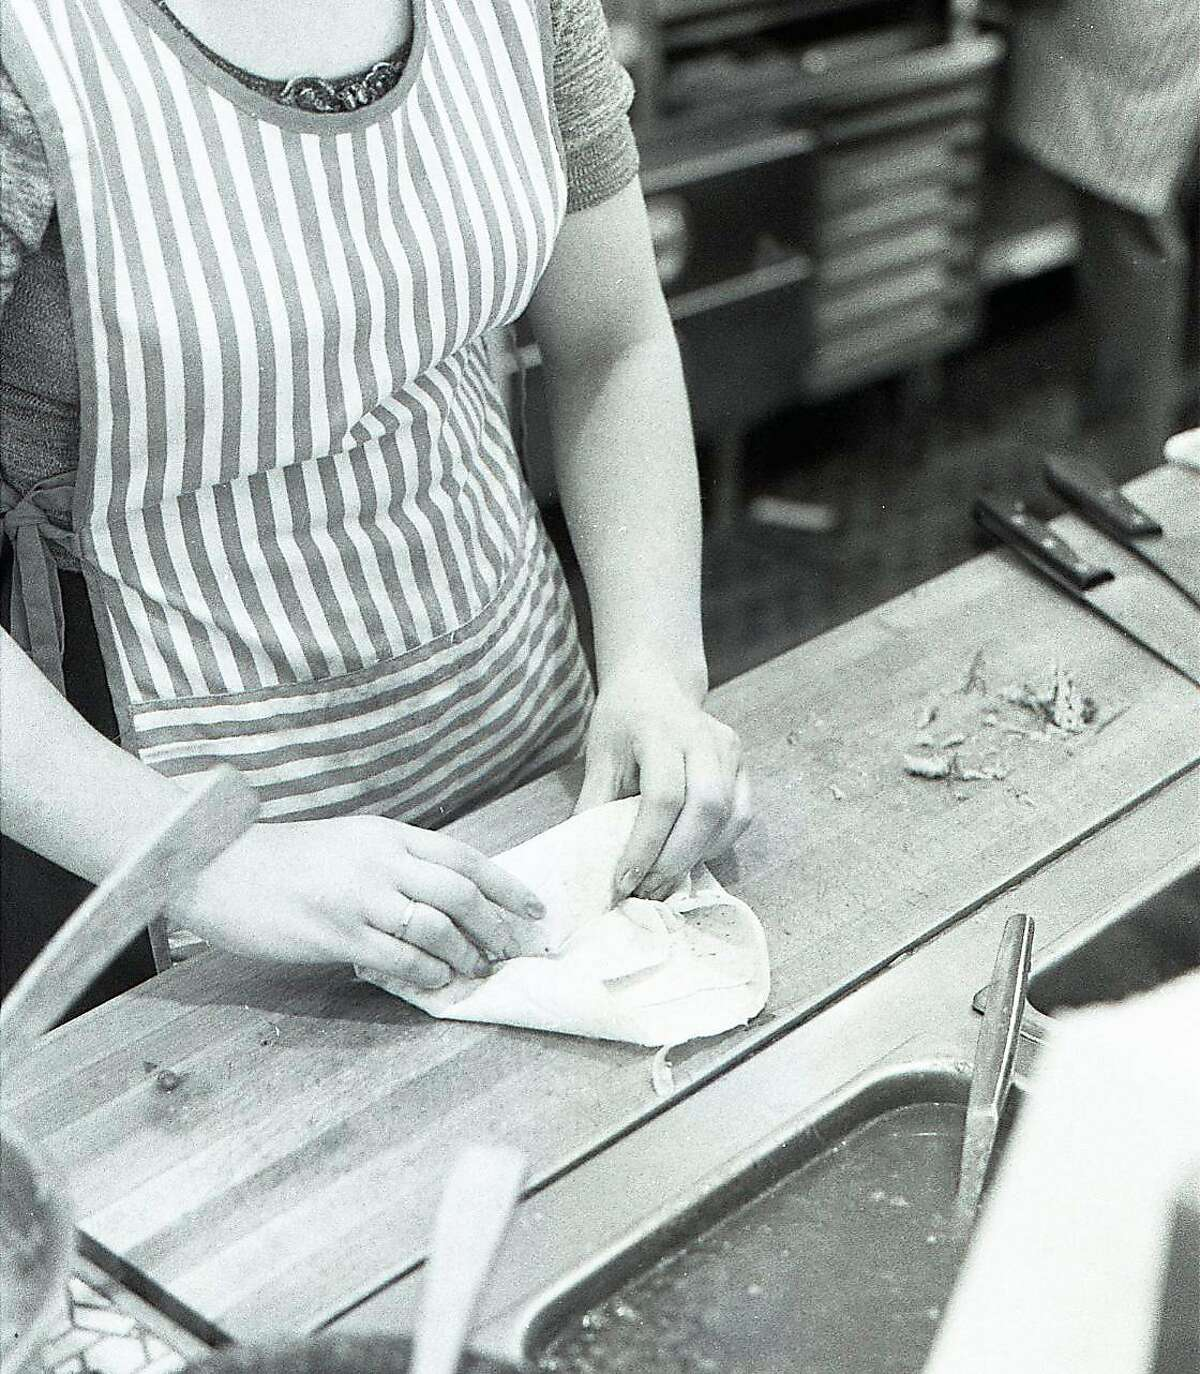 Jan. 20, 1977: A restaurant worker at Nito Burrito assembles a burrito at the San Francisco restaurant.